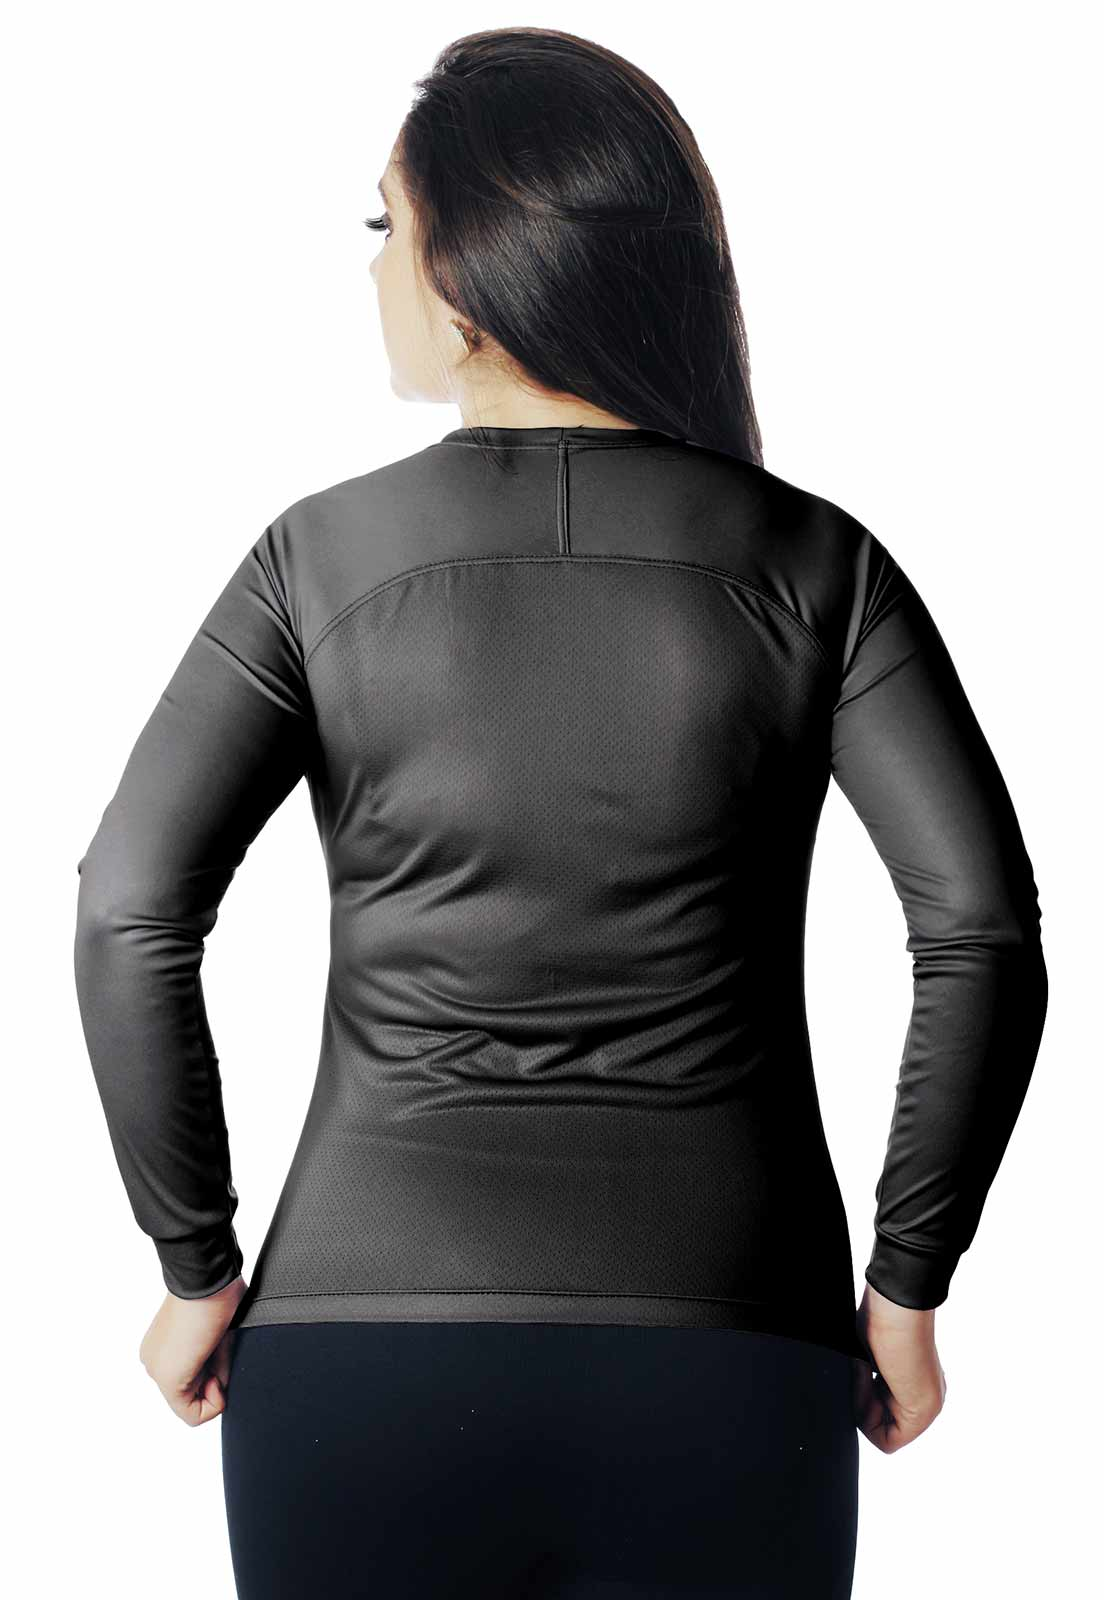 CAMISA DE CASUAL LAZER PROTEÇÃO UV BLACK 003 REAL HUNTER FEMININA  - REAL HUNTER OUTDOORS